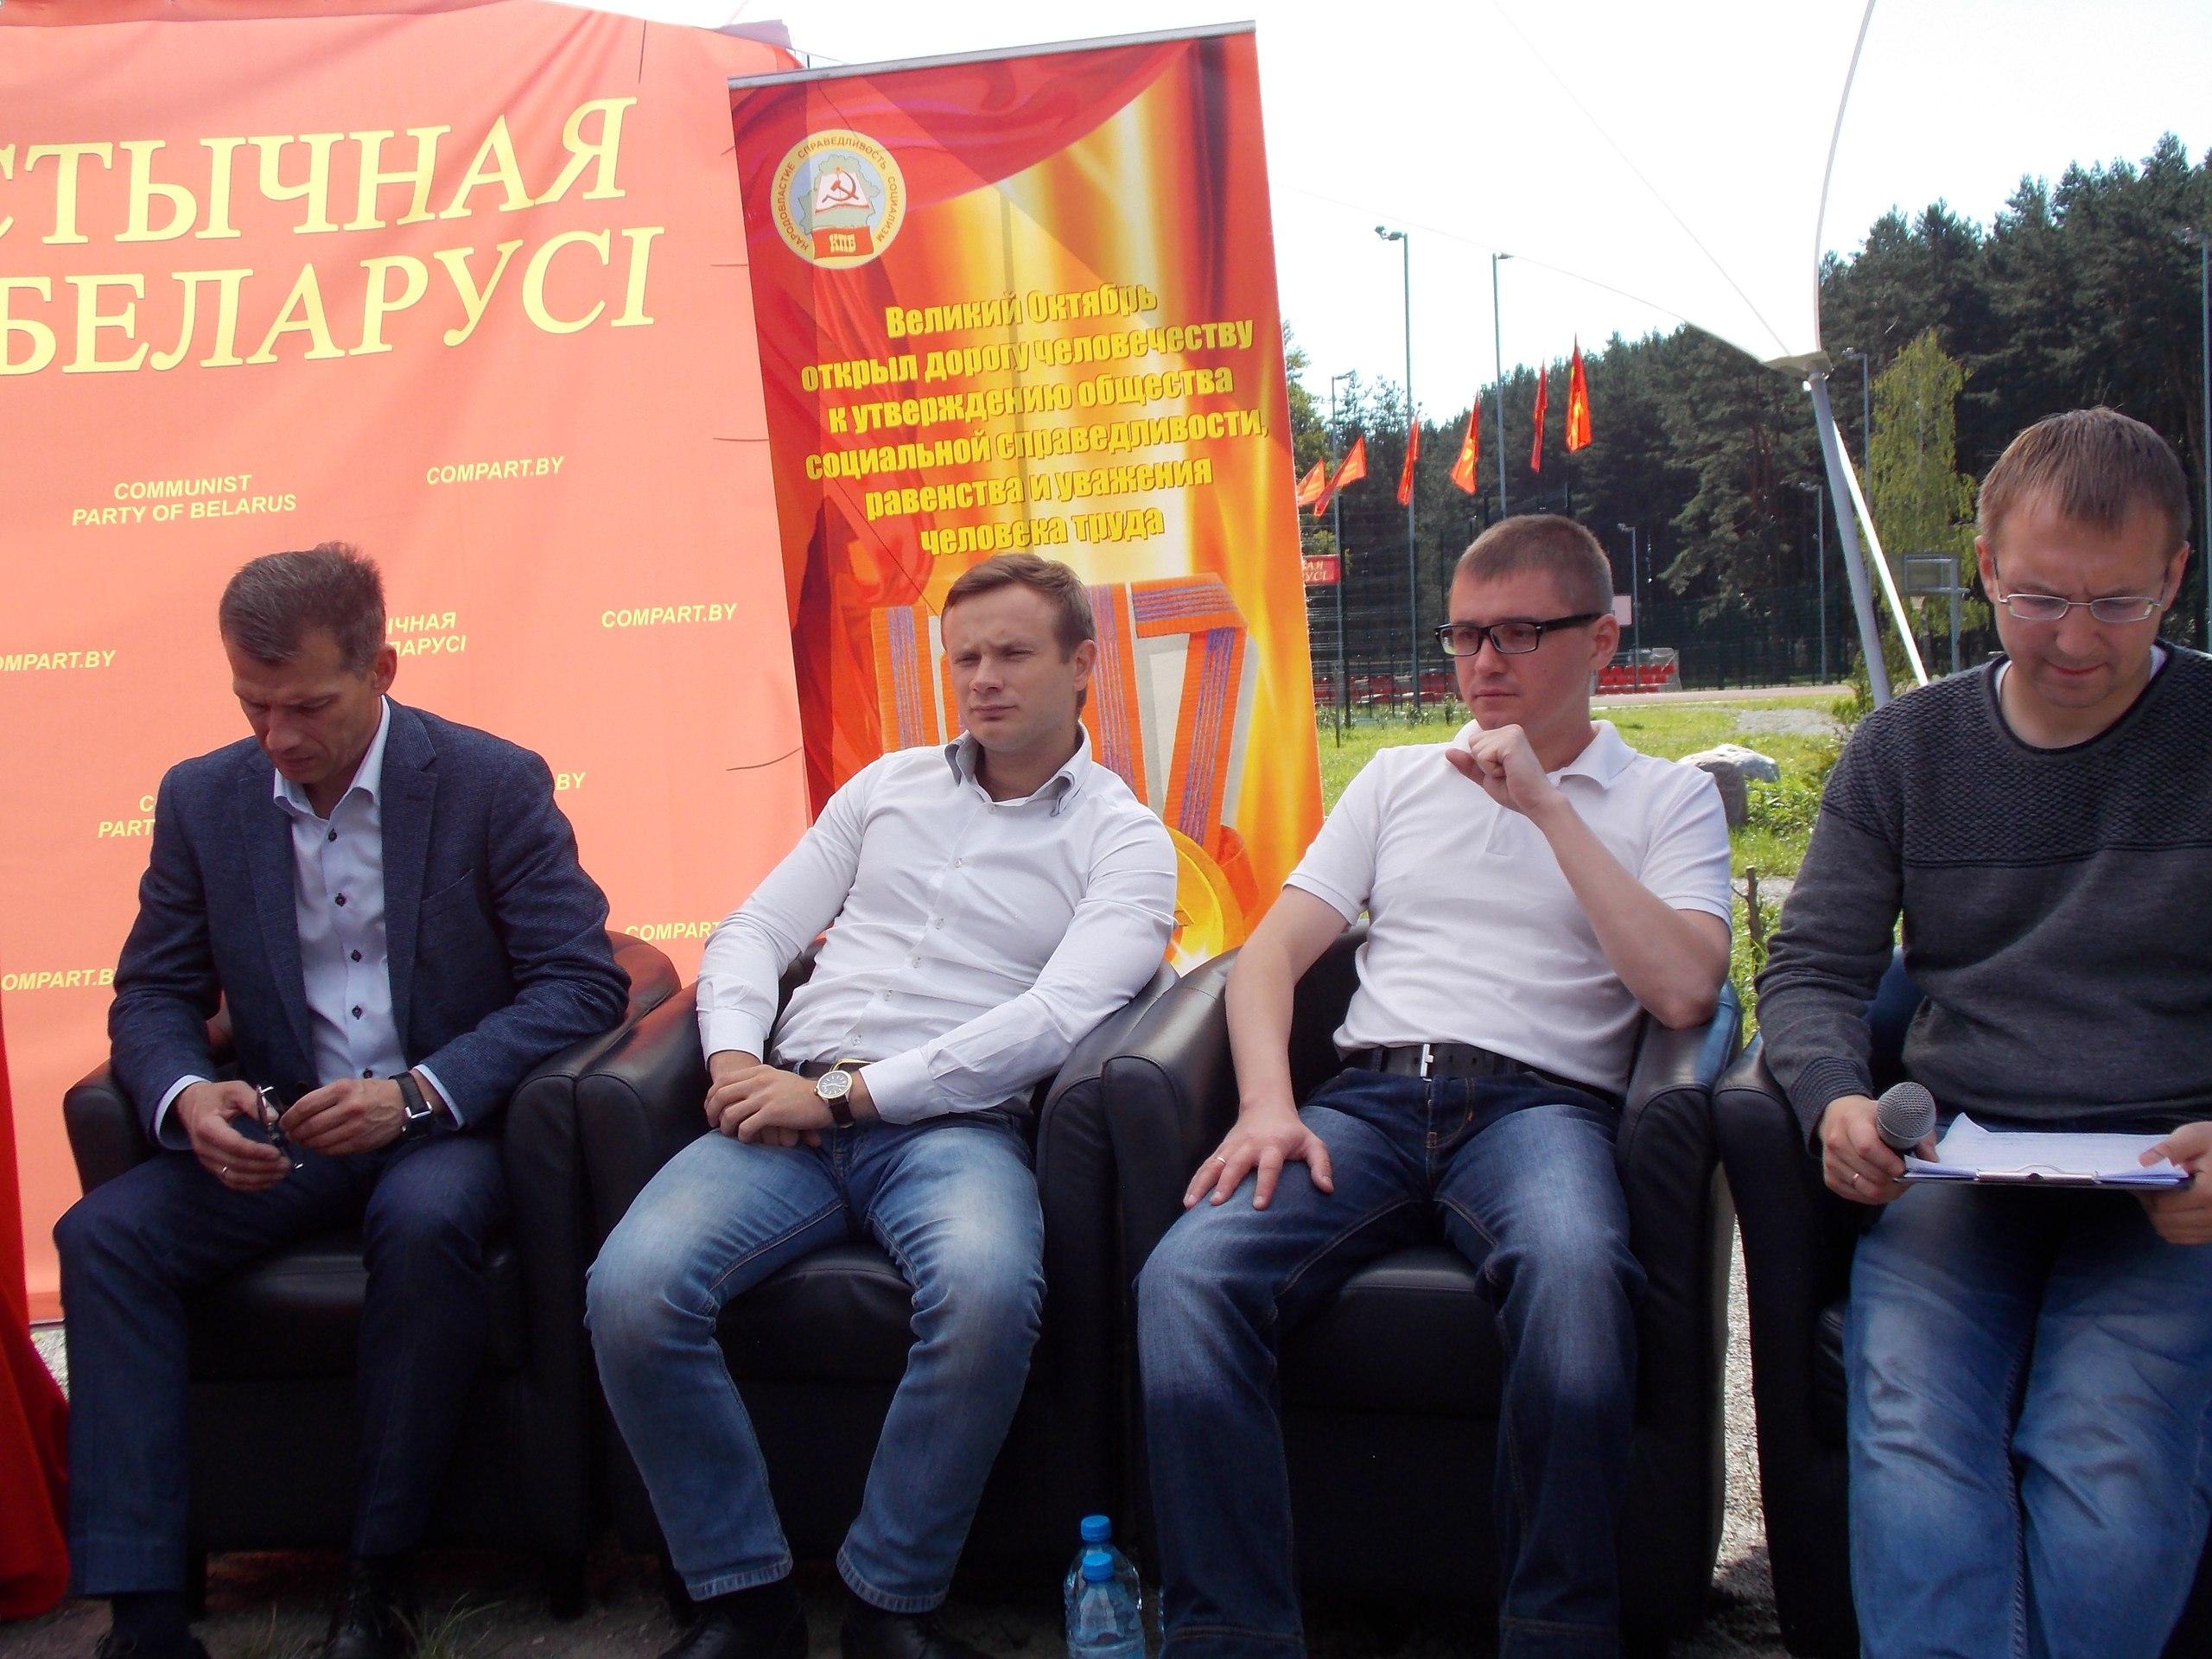 Алексей Сокол, Владимир Исаков, Александр Кононович, Сергей Клишевич